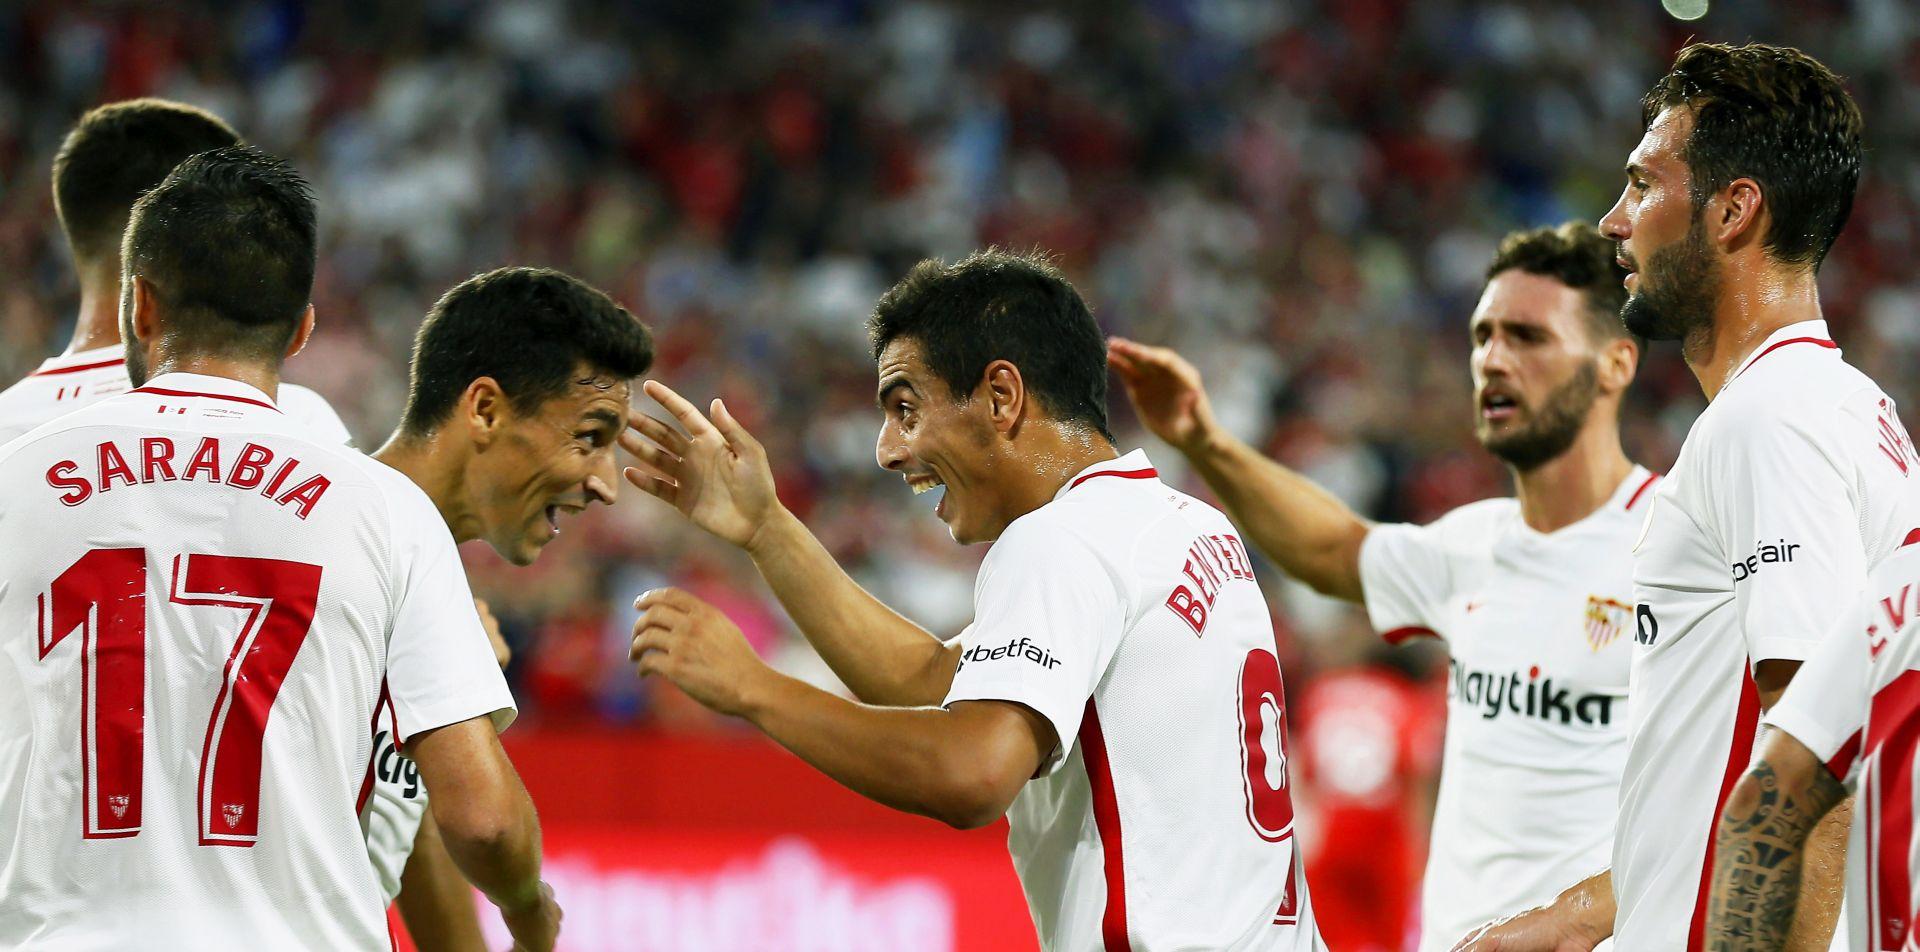 PRIMERA Sevilla 'razbila' Real Madrid, Modriću poništen gol